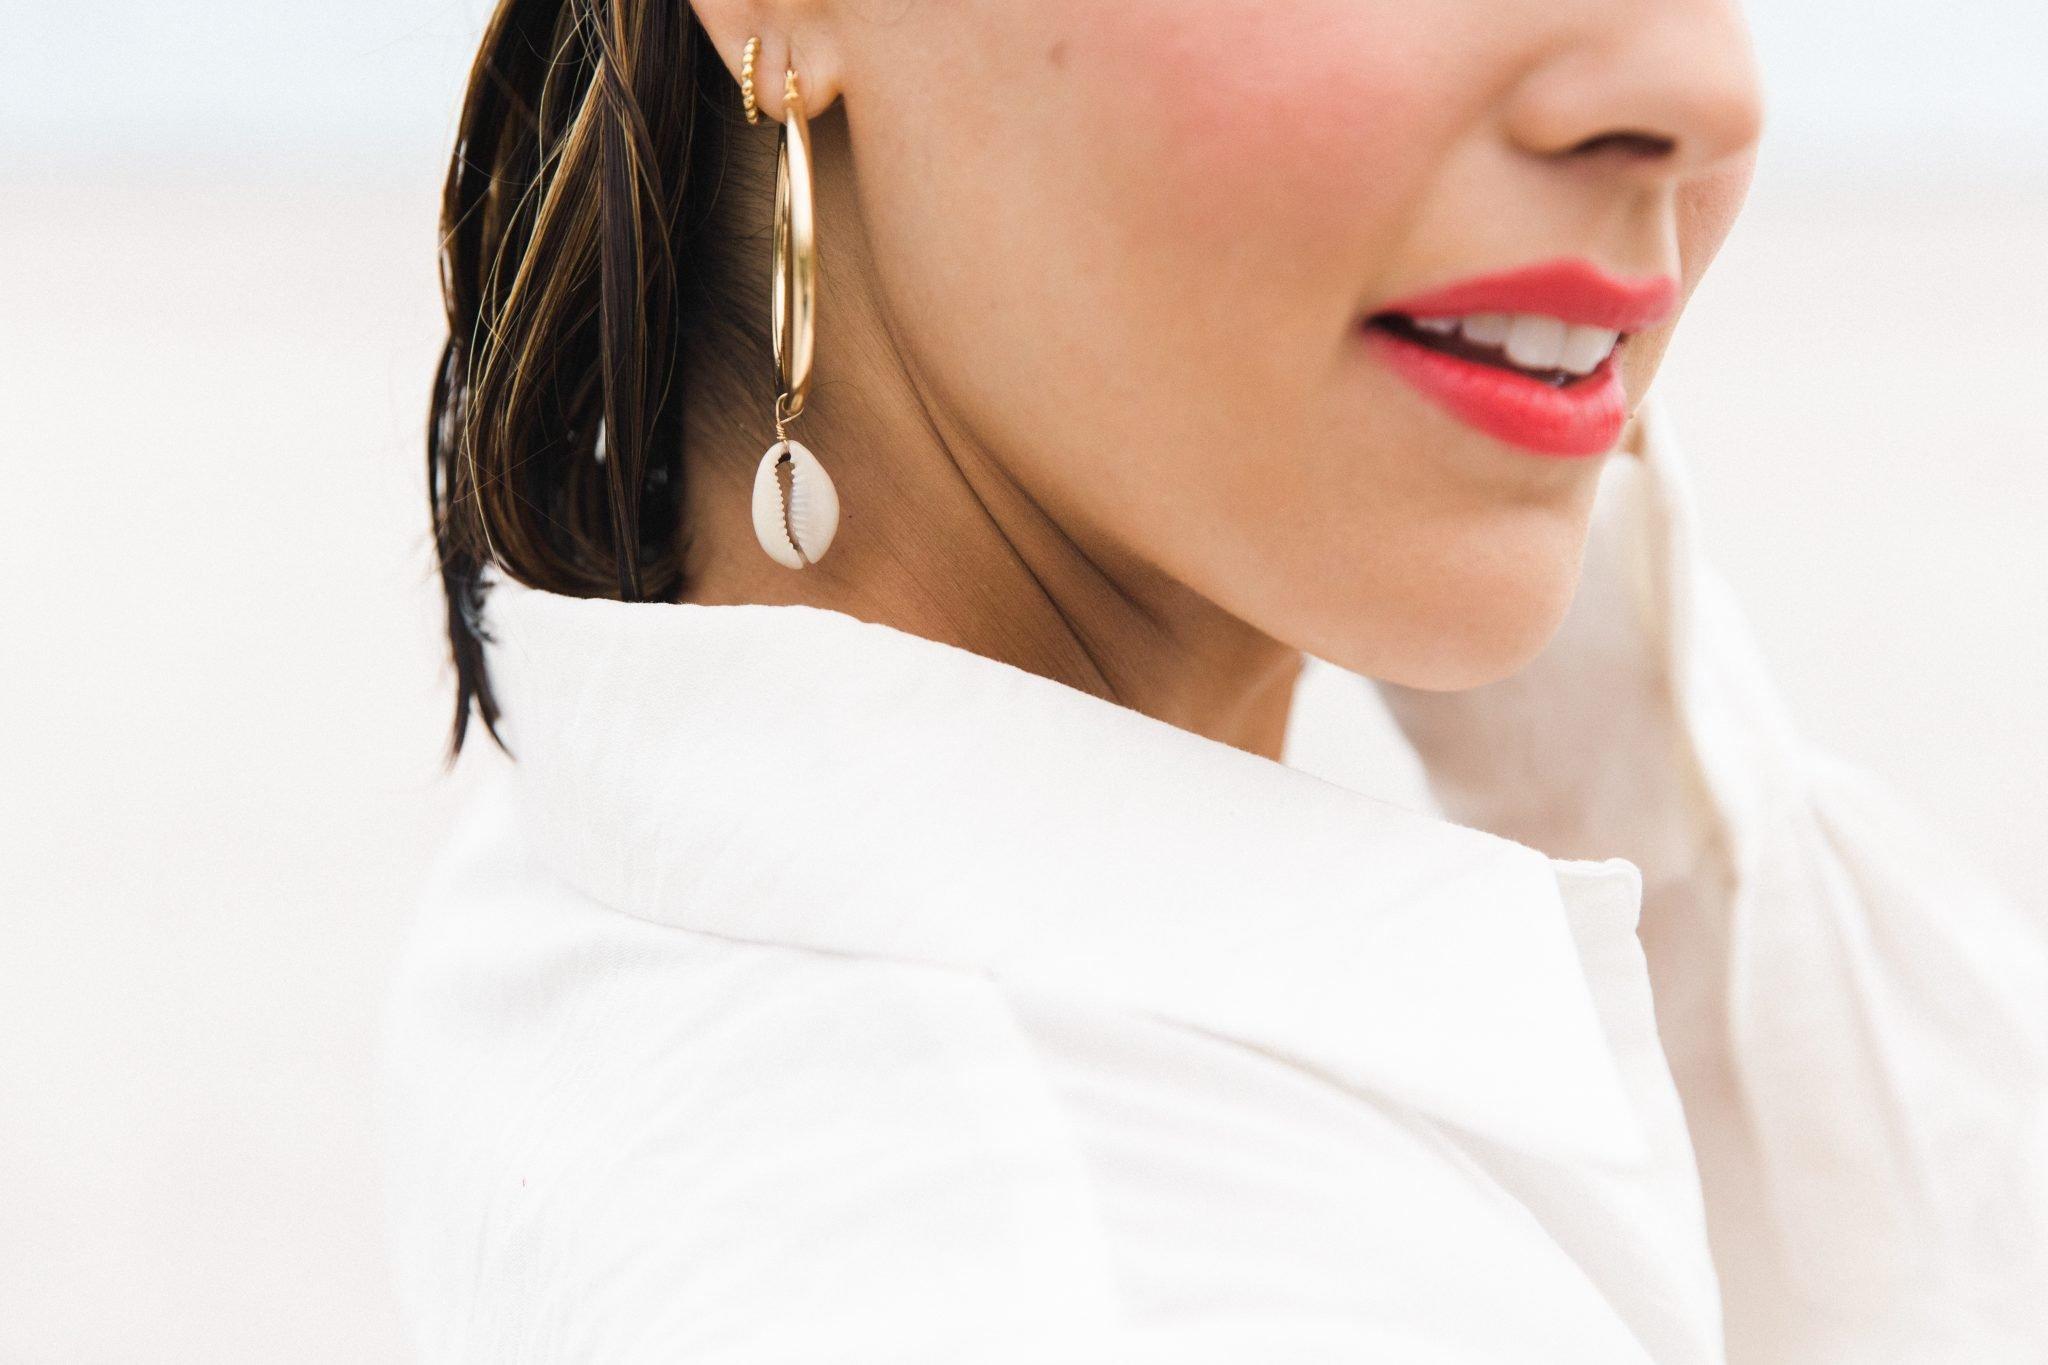 taudrey-x-kelly-saks-playa-collection-san-juan-earrings